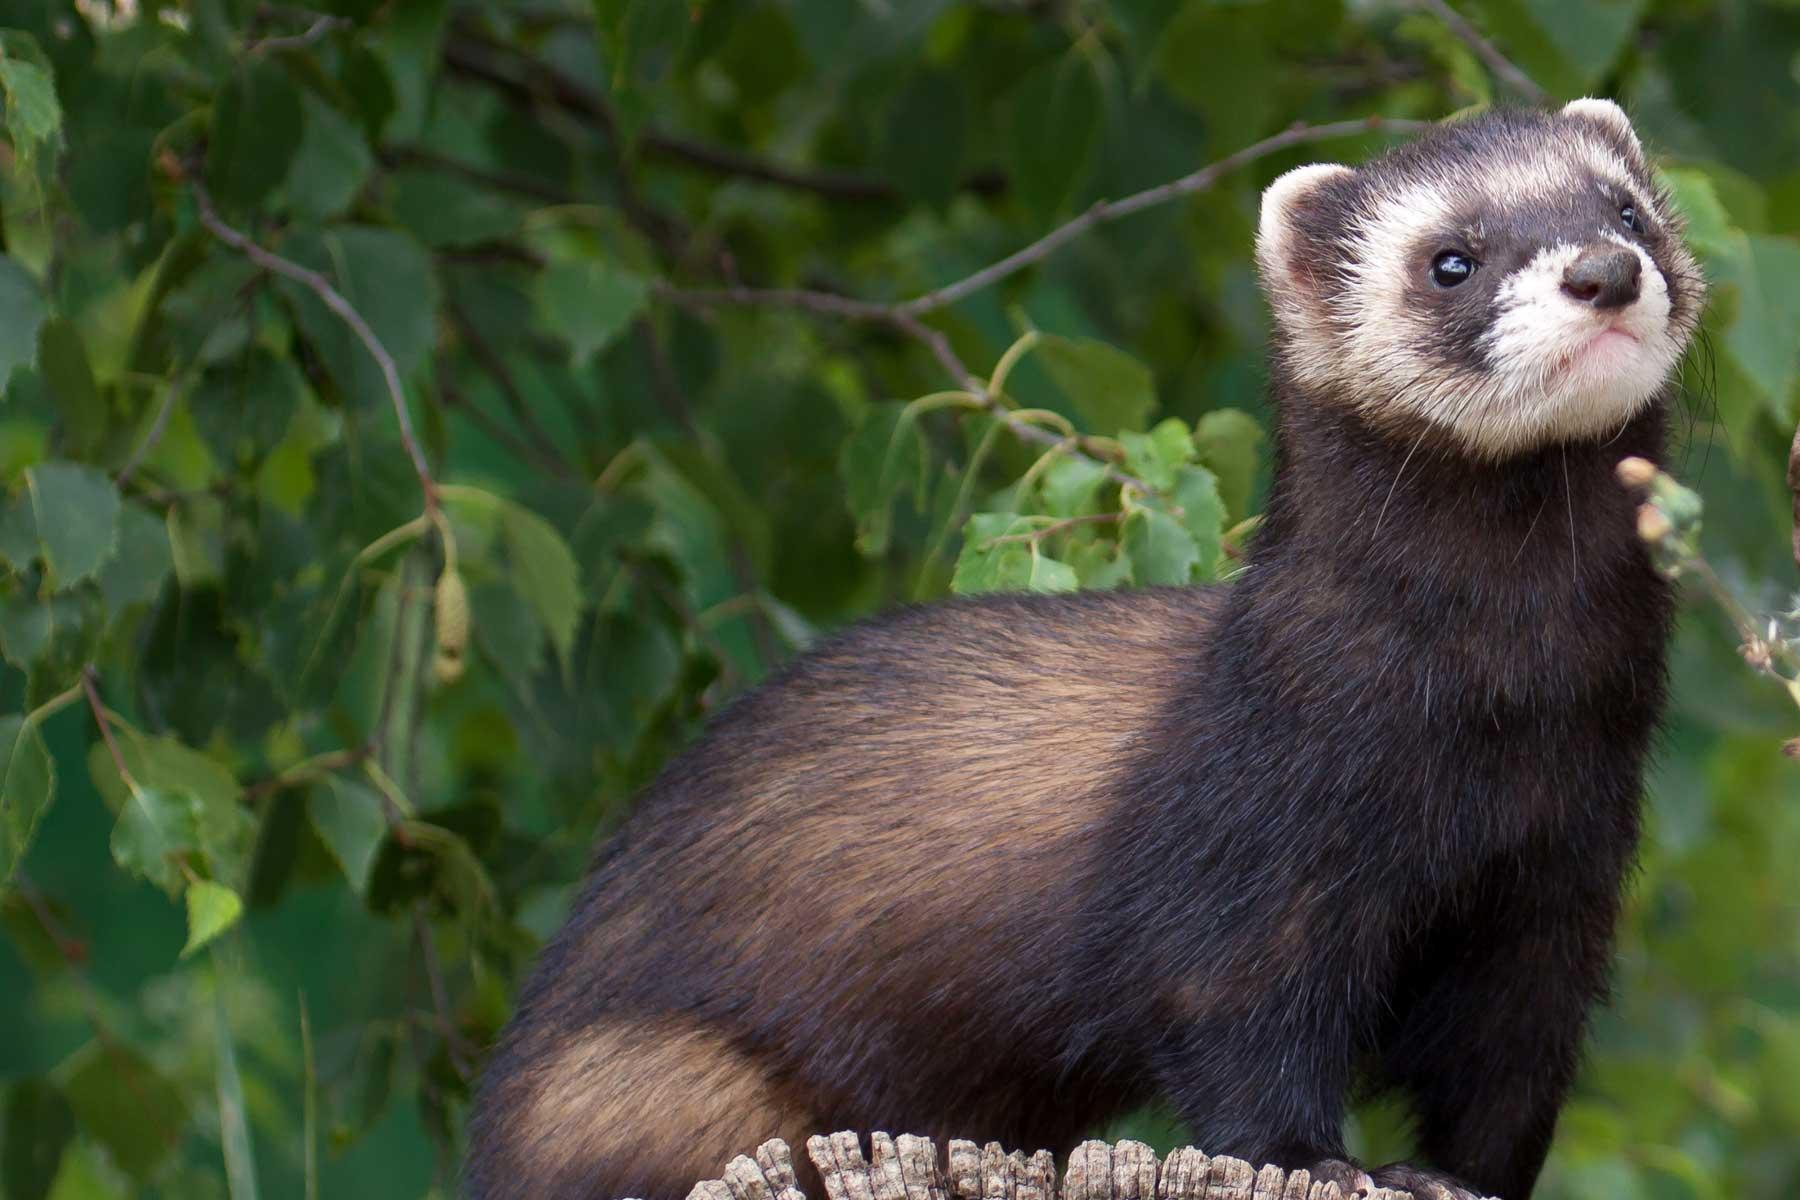 A conservation success story: the European Polecat